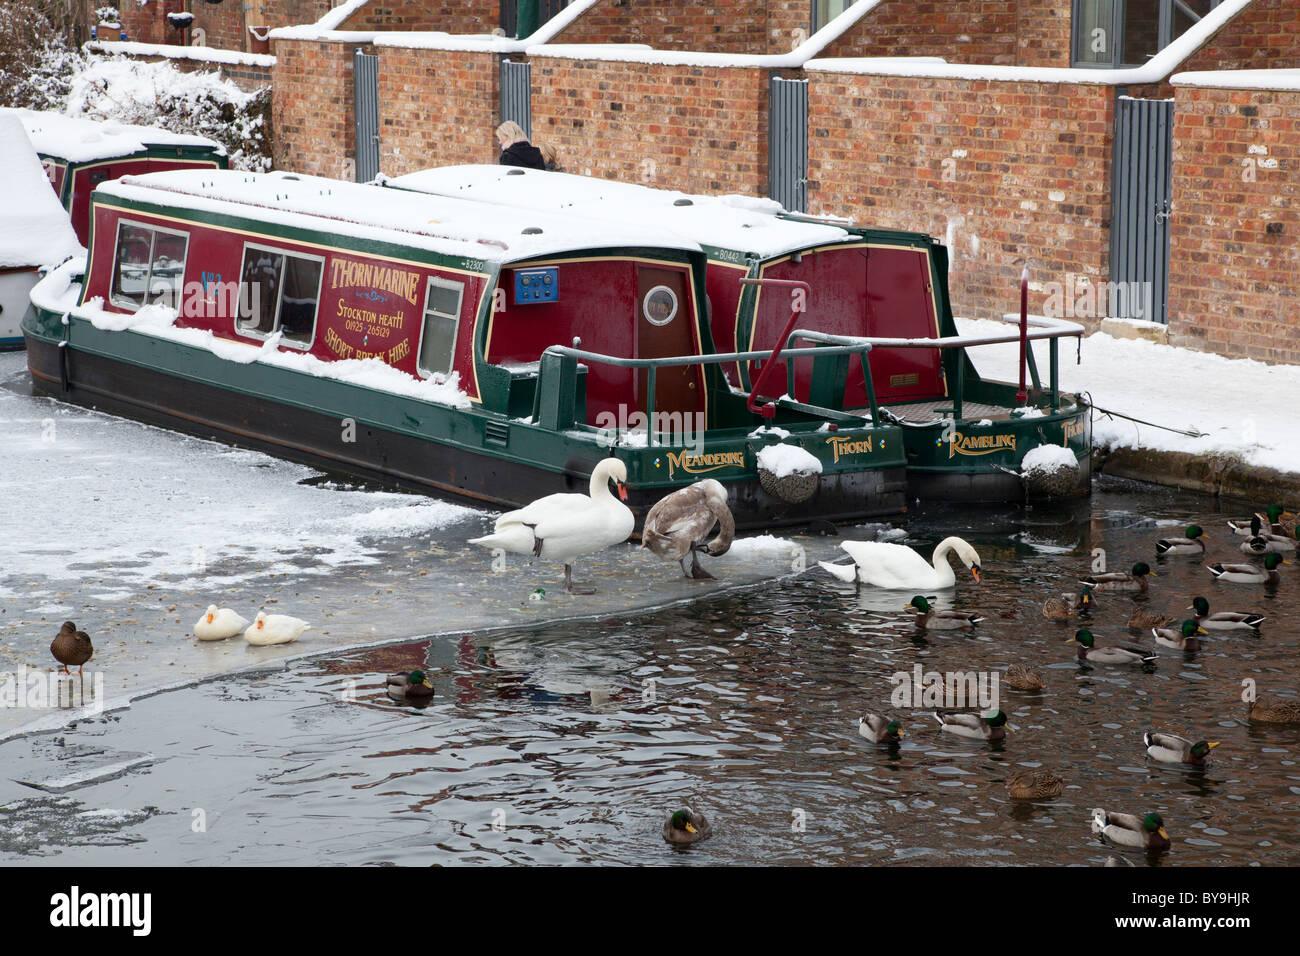 Swans, ducks and narrowboats on the frozen Bridgewater Canal at Stockton Heath, Cheshire - Stock Image